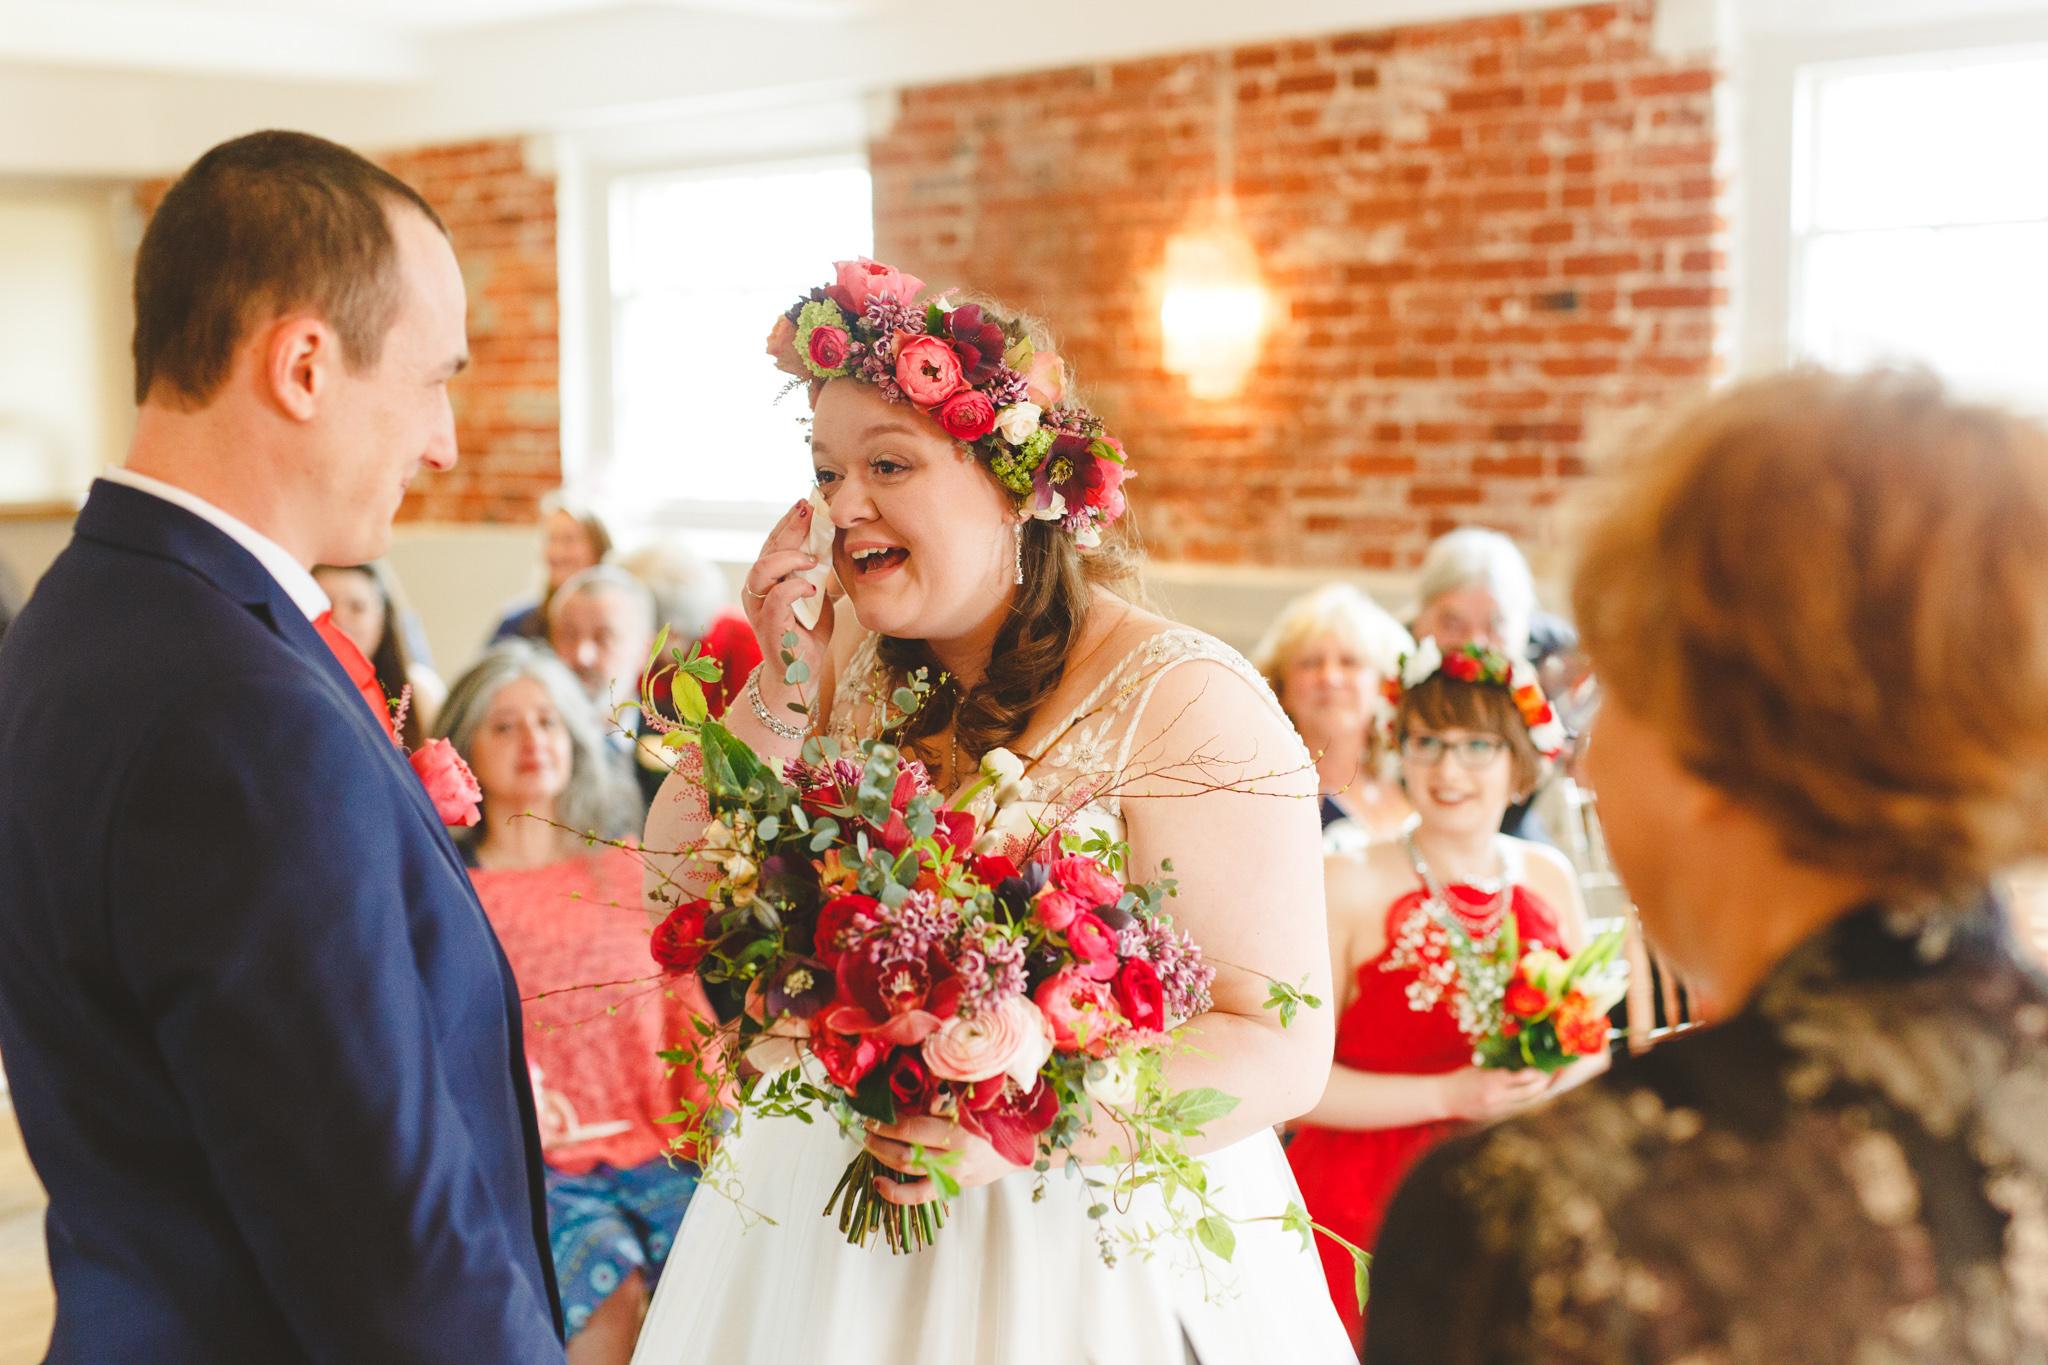 derbyshire-wedding-photographer-march-april-24.jpg